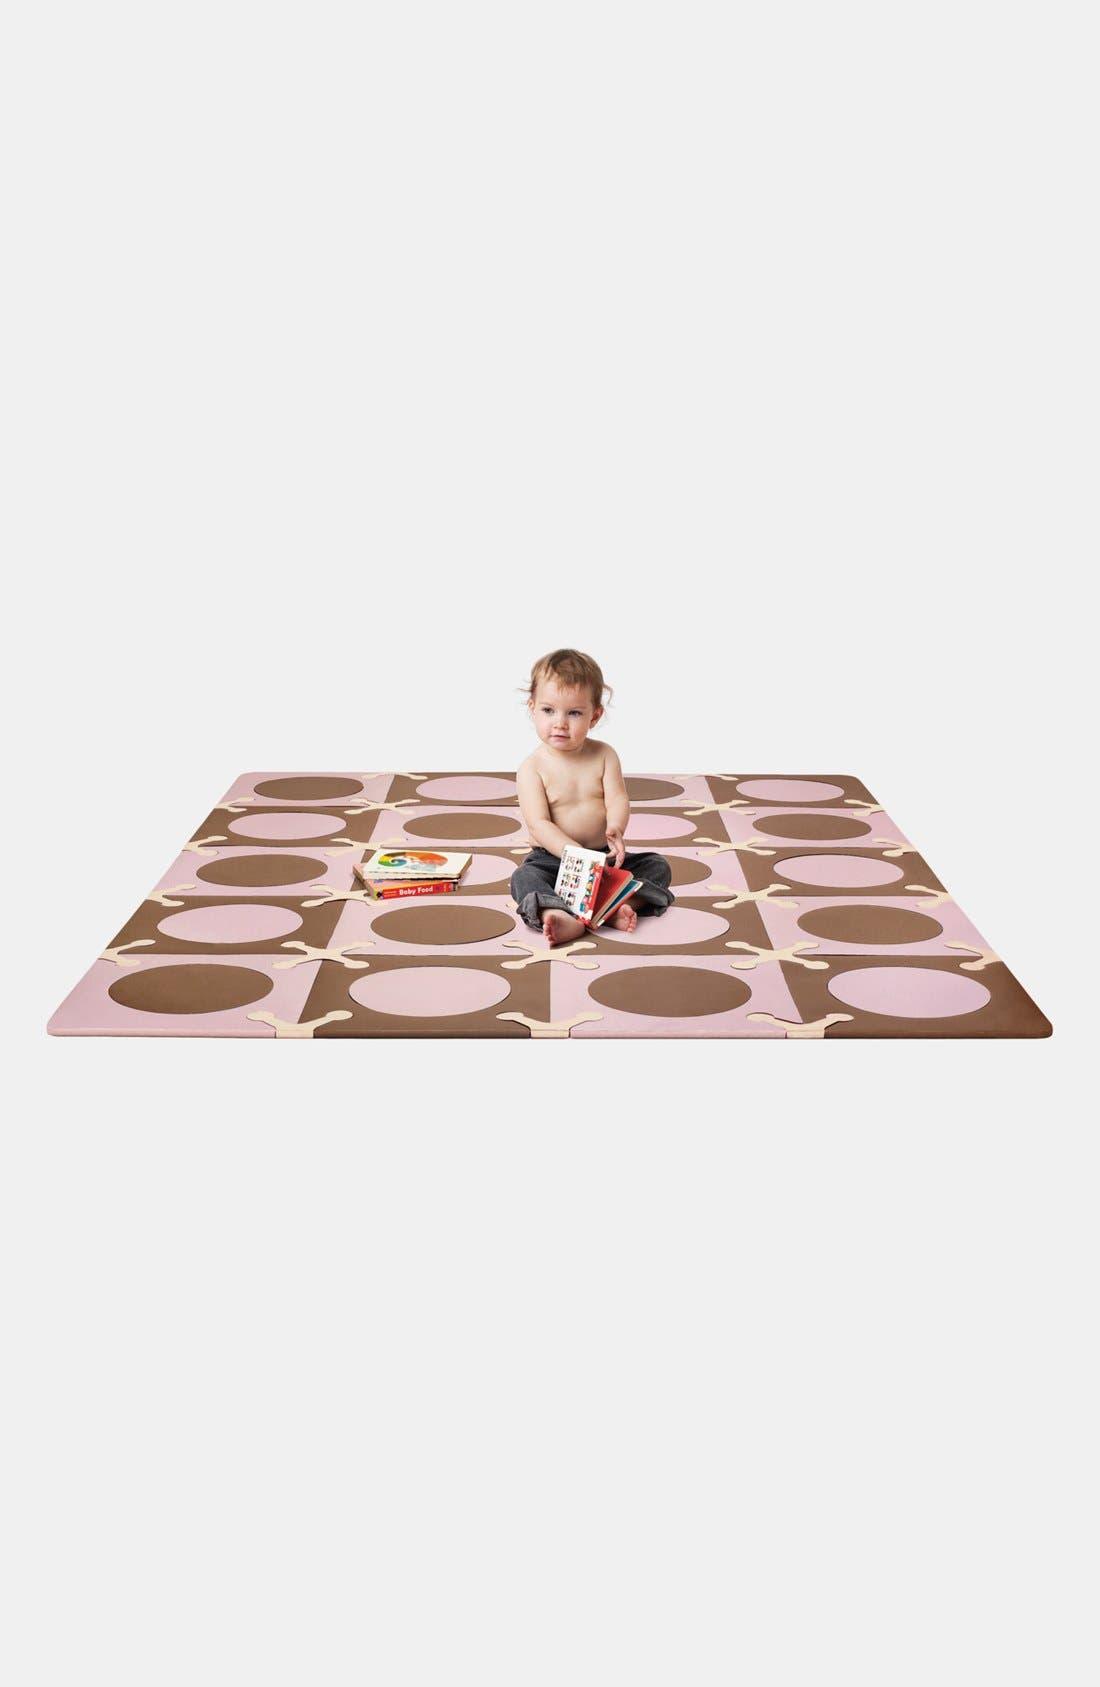 Alternate Image 1 Selected - Skip Hop 'PLAYSPOTS - Zoo' Foam Floor Tiles